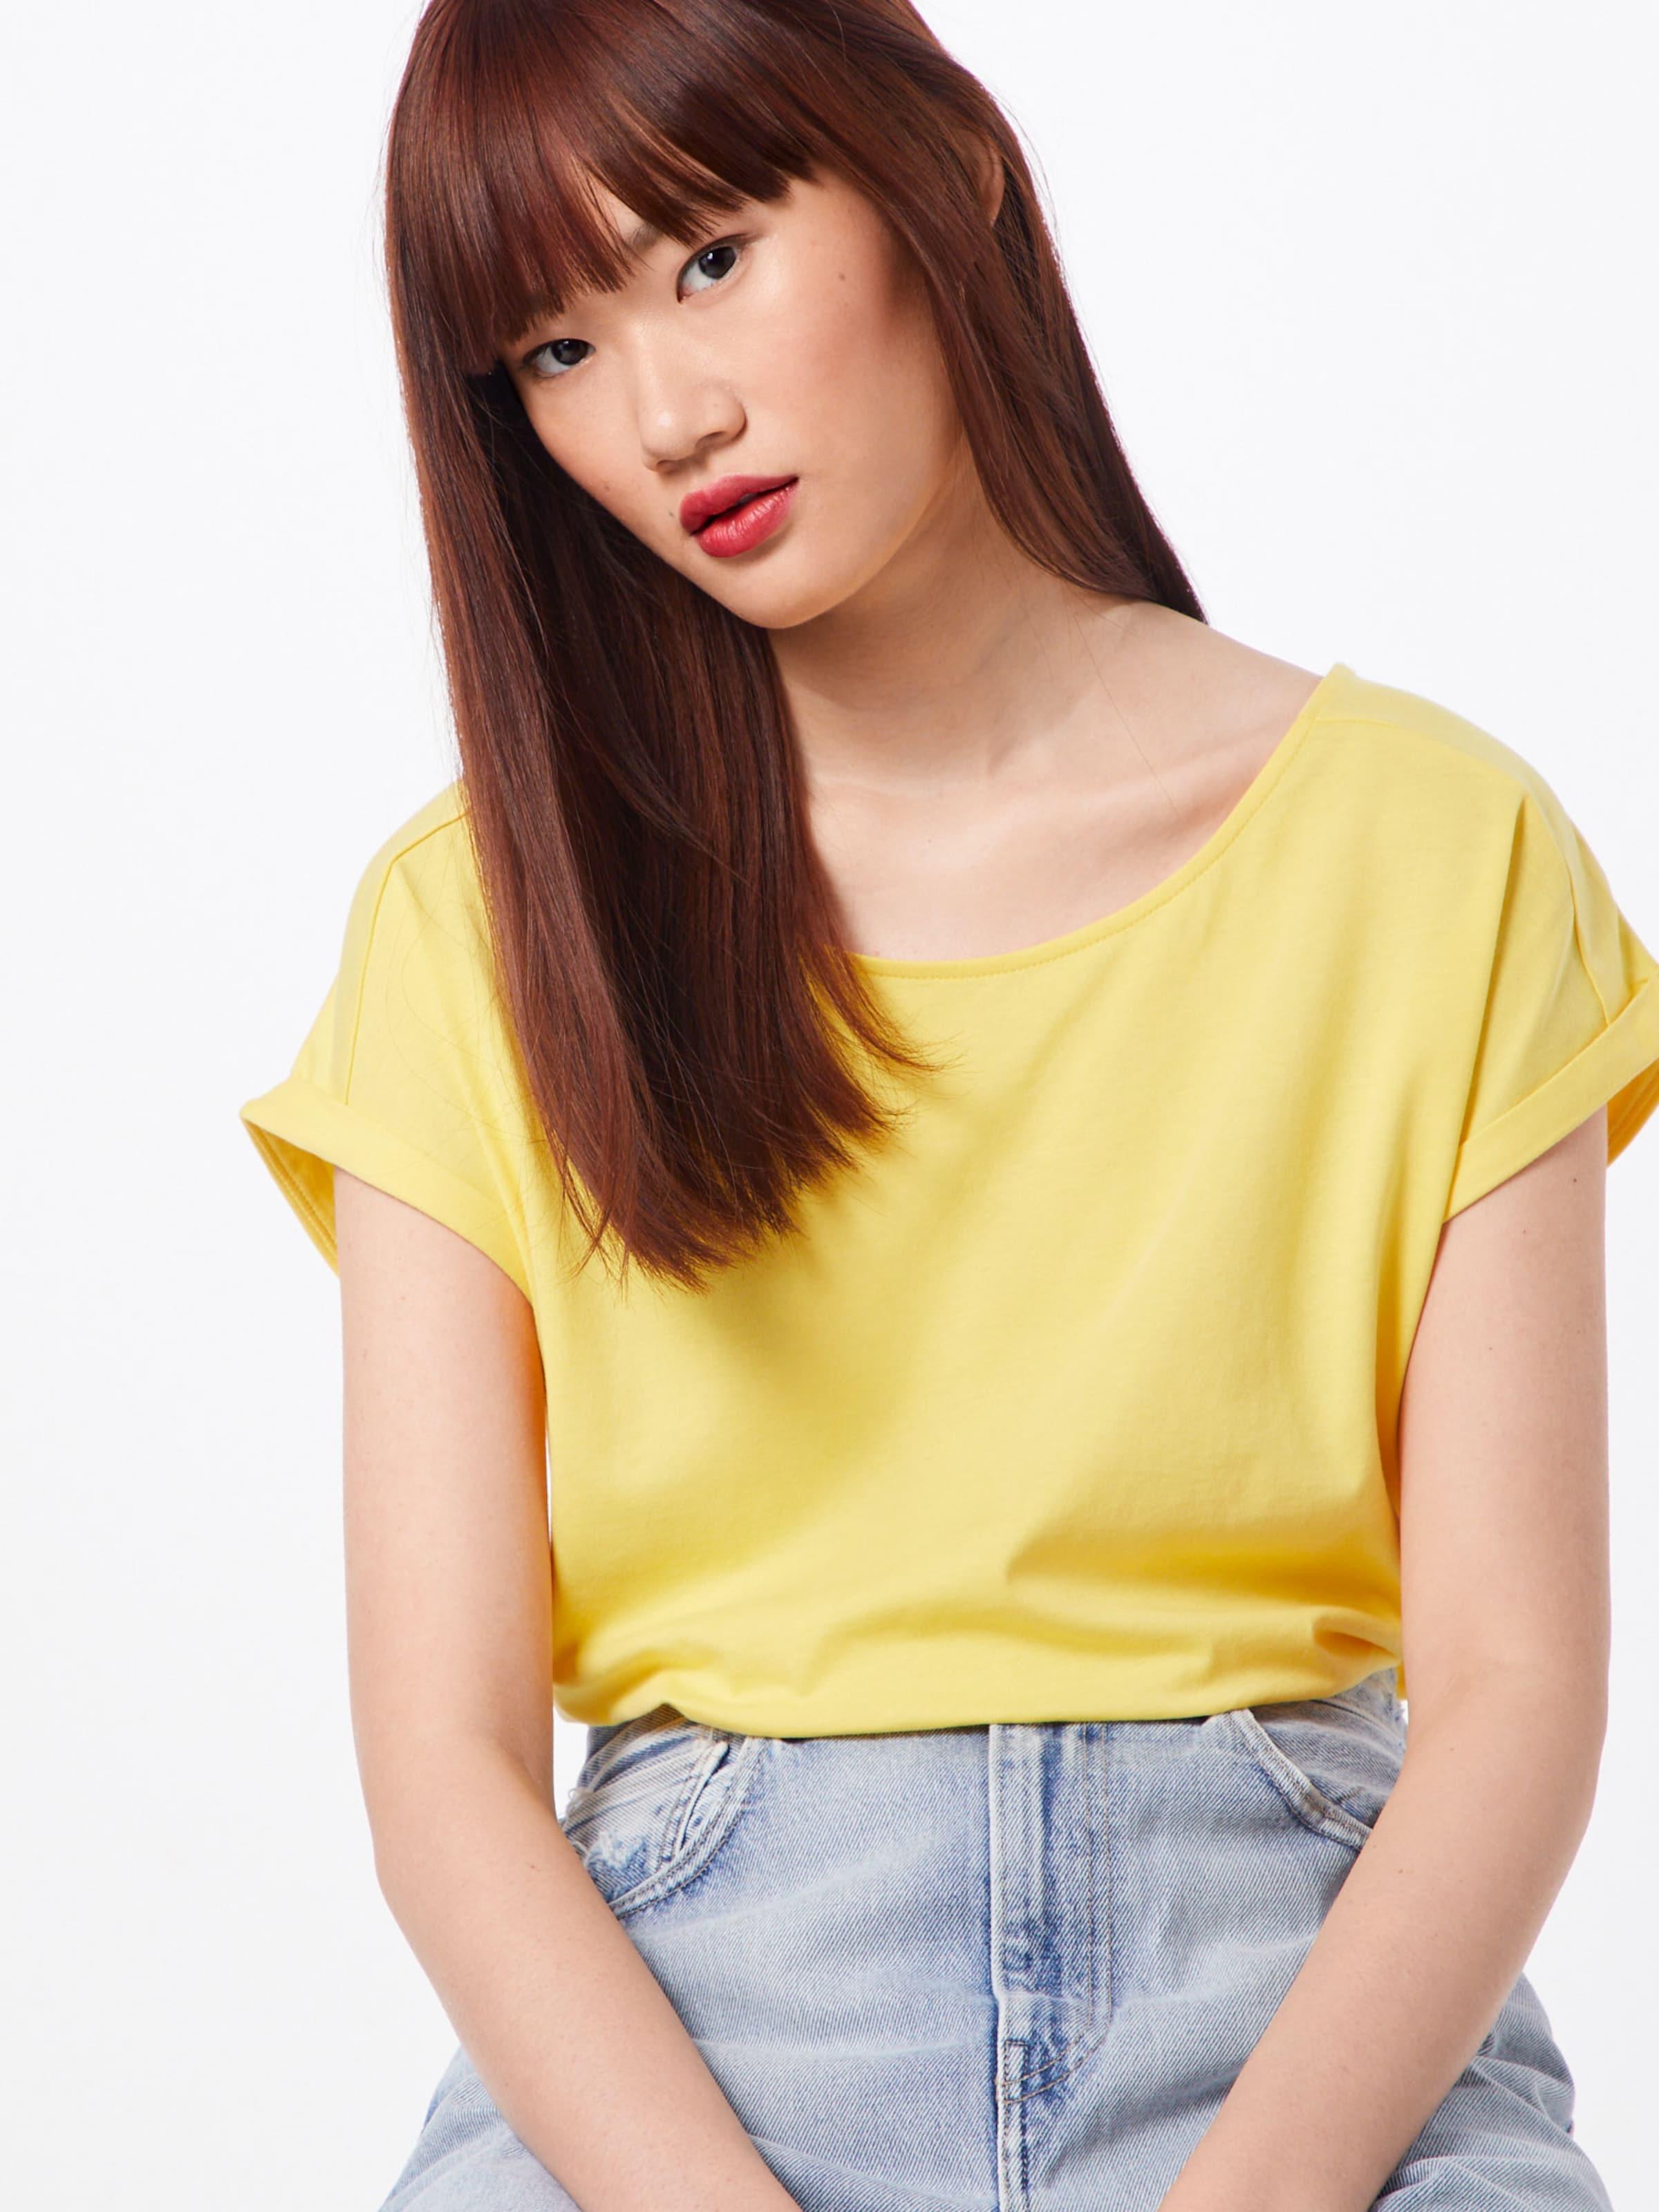 oliver In S T Gelb shirt Xn8w0OPk